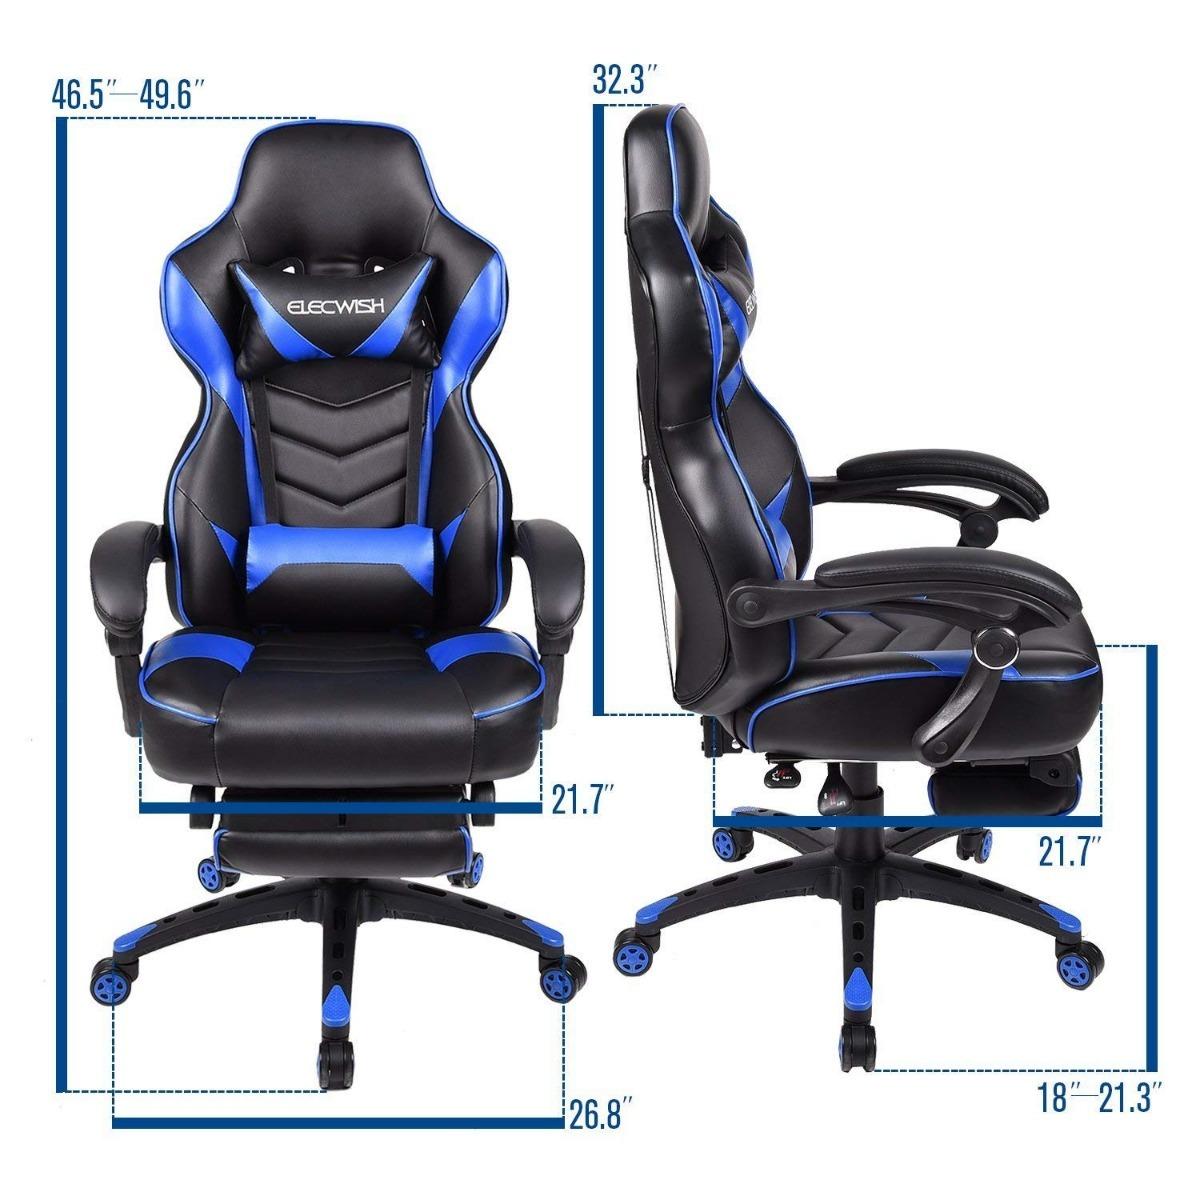 Silla Gaming Gamer Elecwish Ergonomic ChairPu Lea Computer dsBhrtQCx